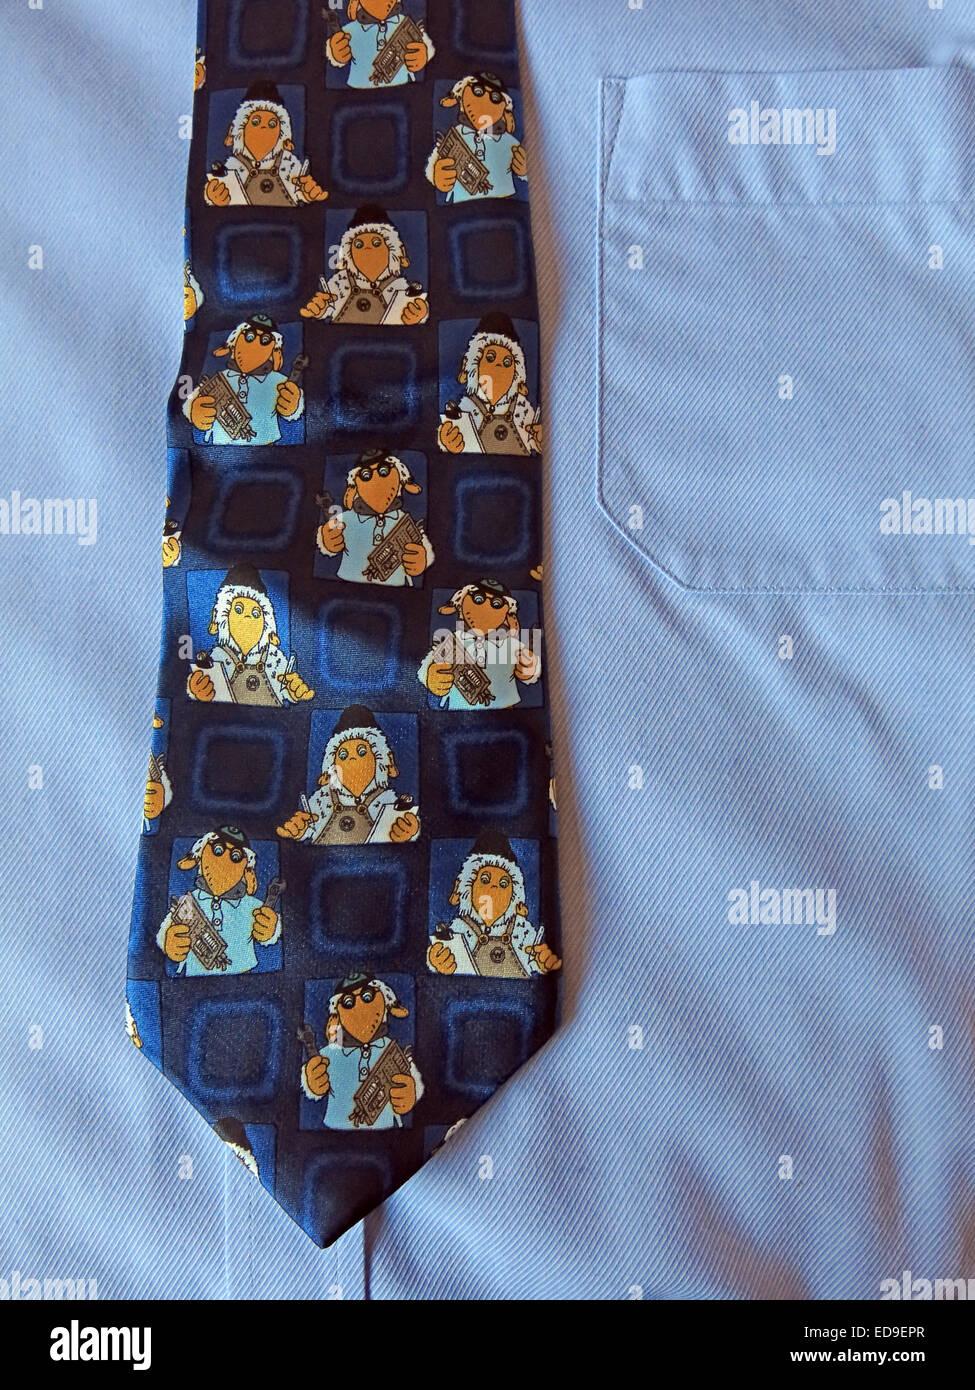 Laden Sie dieses Alamy Stockfoto Interessante Oldtimer Onkel Bulgarien Wombles Krawatte, männliche Antik in Seide - ED9EPR